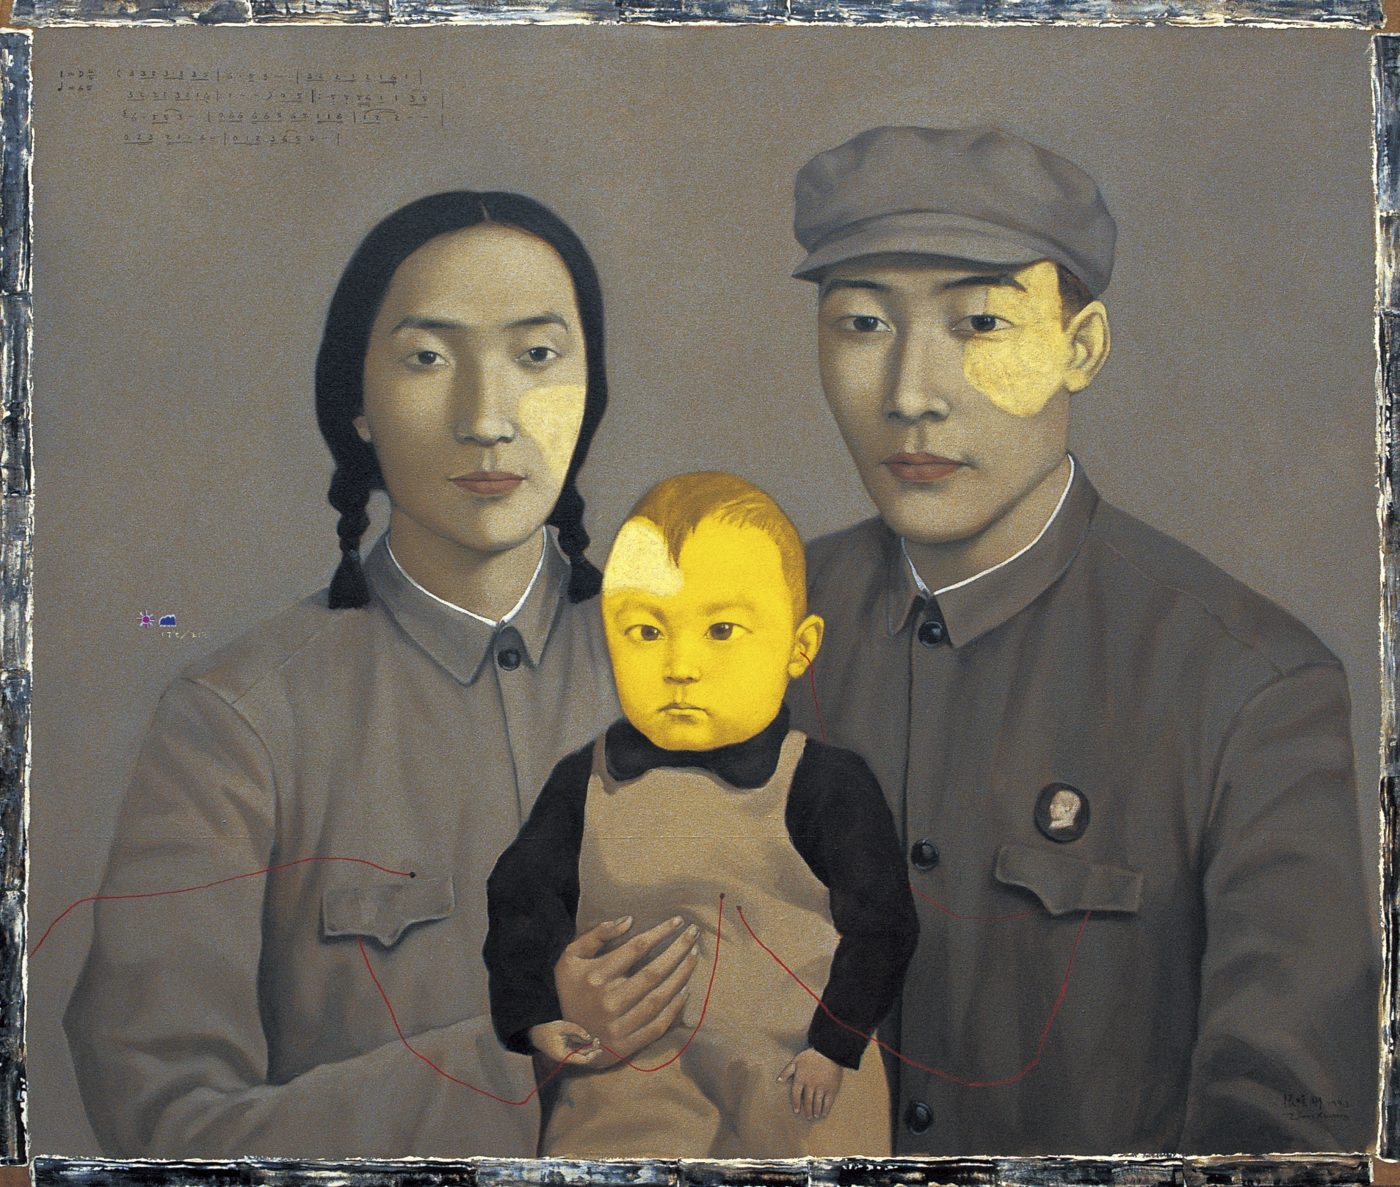 Bloodline — Big Family No. 2, 1993, by Zhang Xiaogang